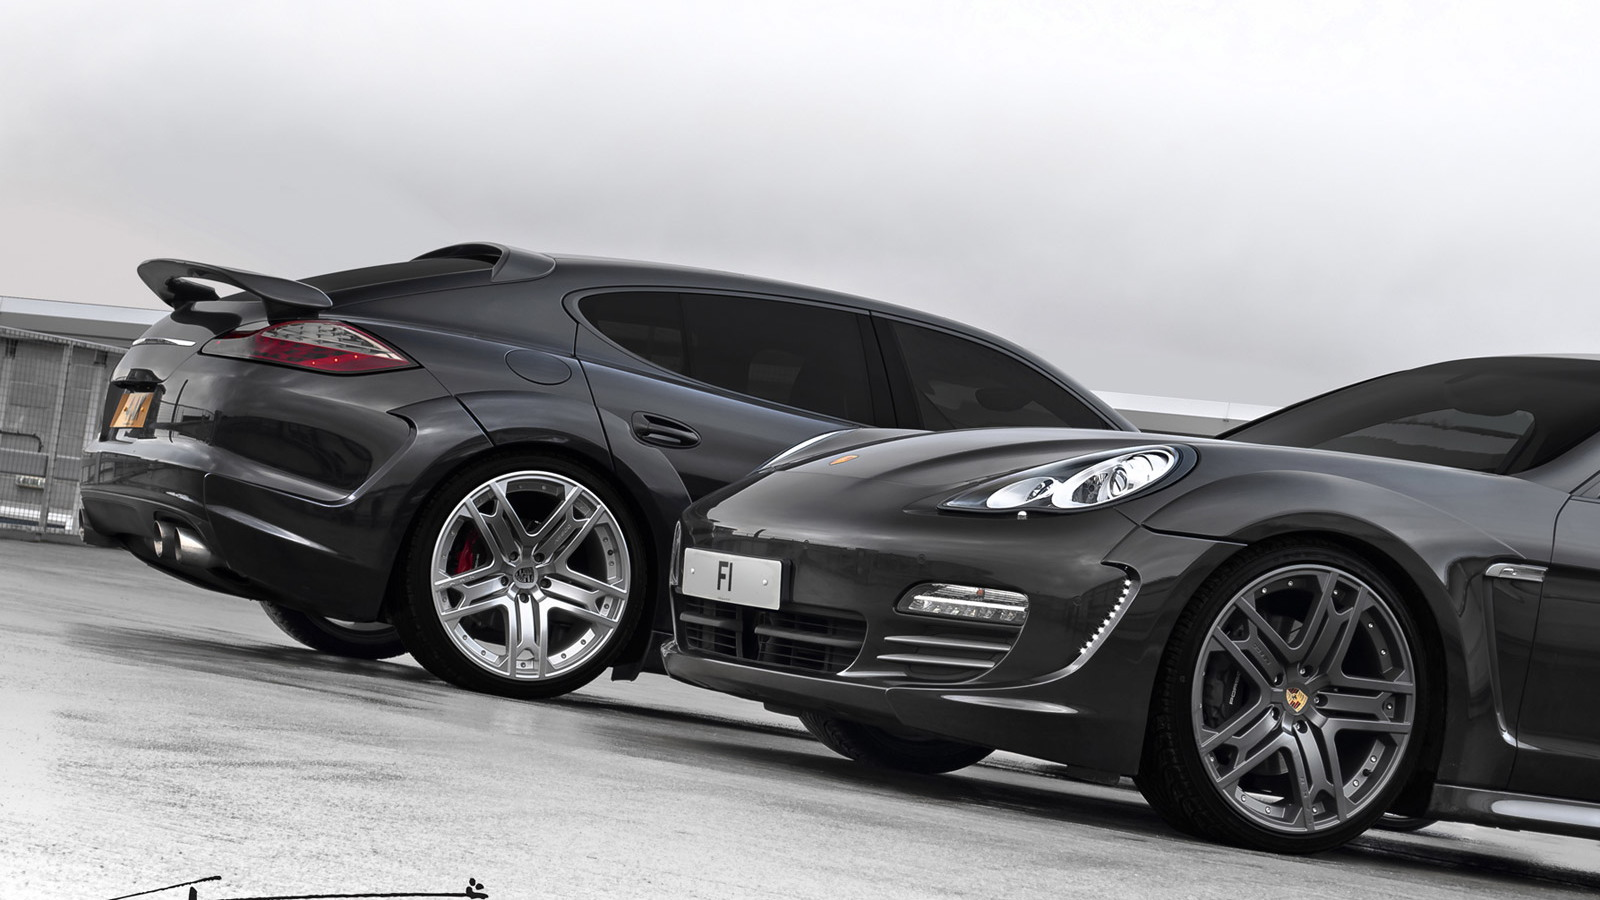 Wide-body Porsche Panamera by A. Kahn Design